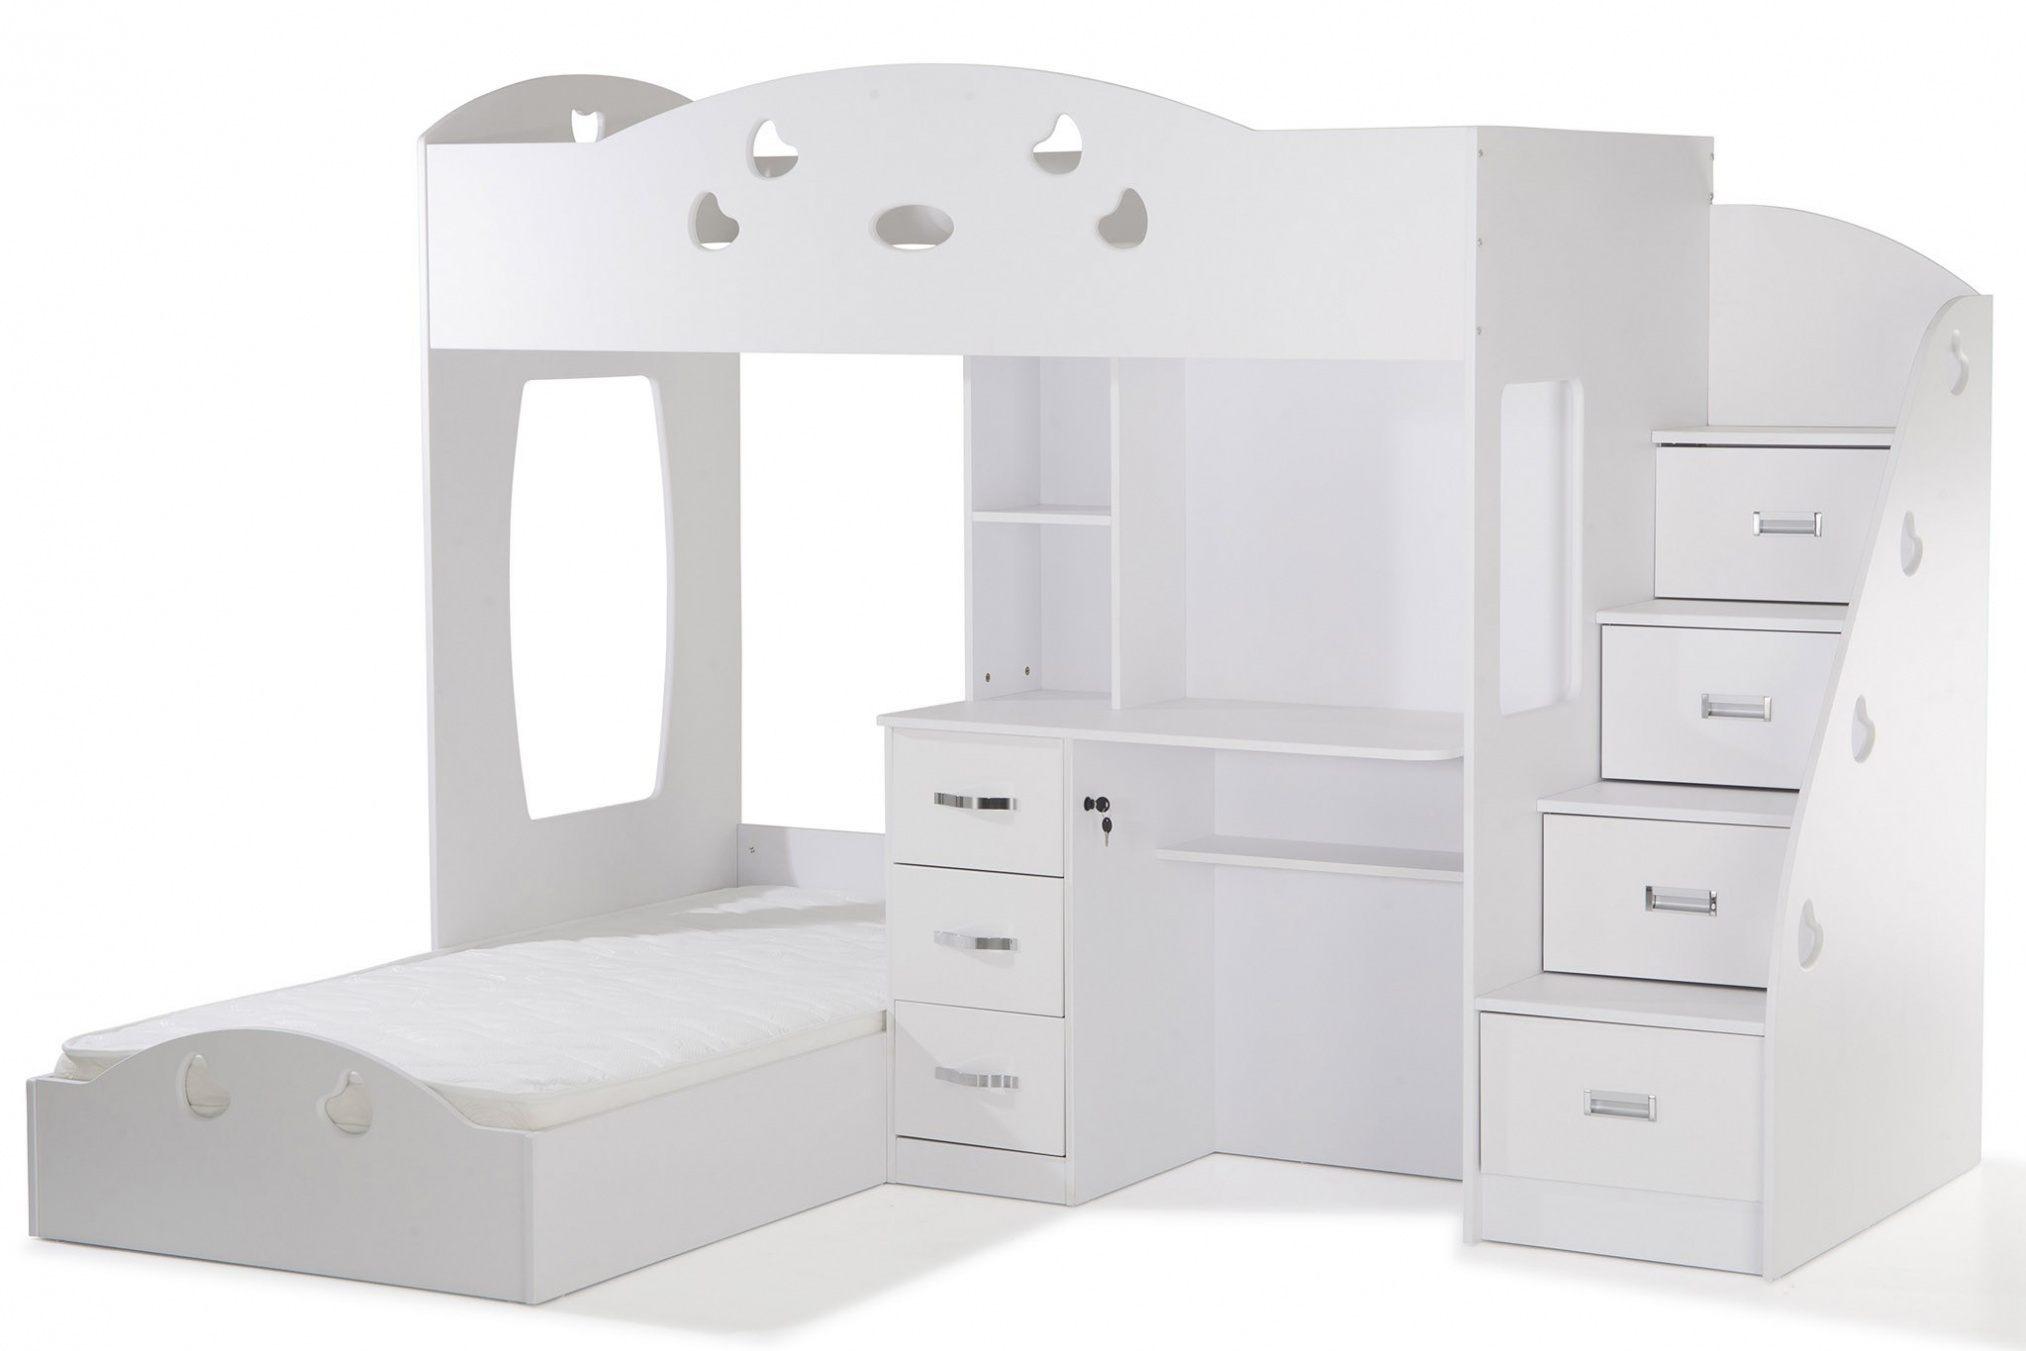 Lit Superposé Adulte Ikea Impressionnant Brambles Lit Superposé Fille — Bramblesdinnerhouse